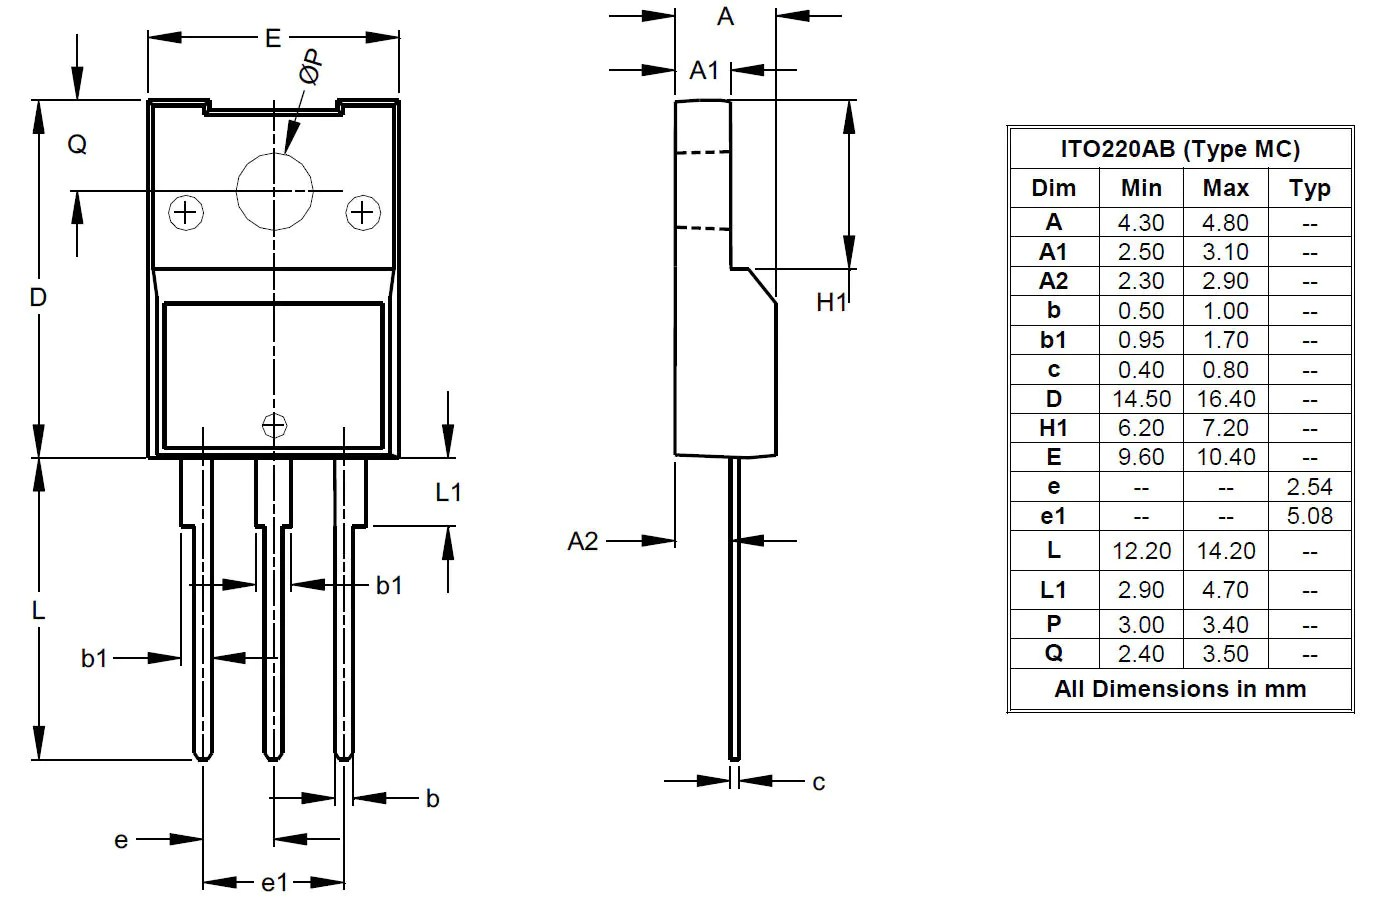 Mercedes S55 Fuse Box Diagram. Mercedes. Auto Fuse Box Diagram